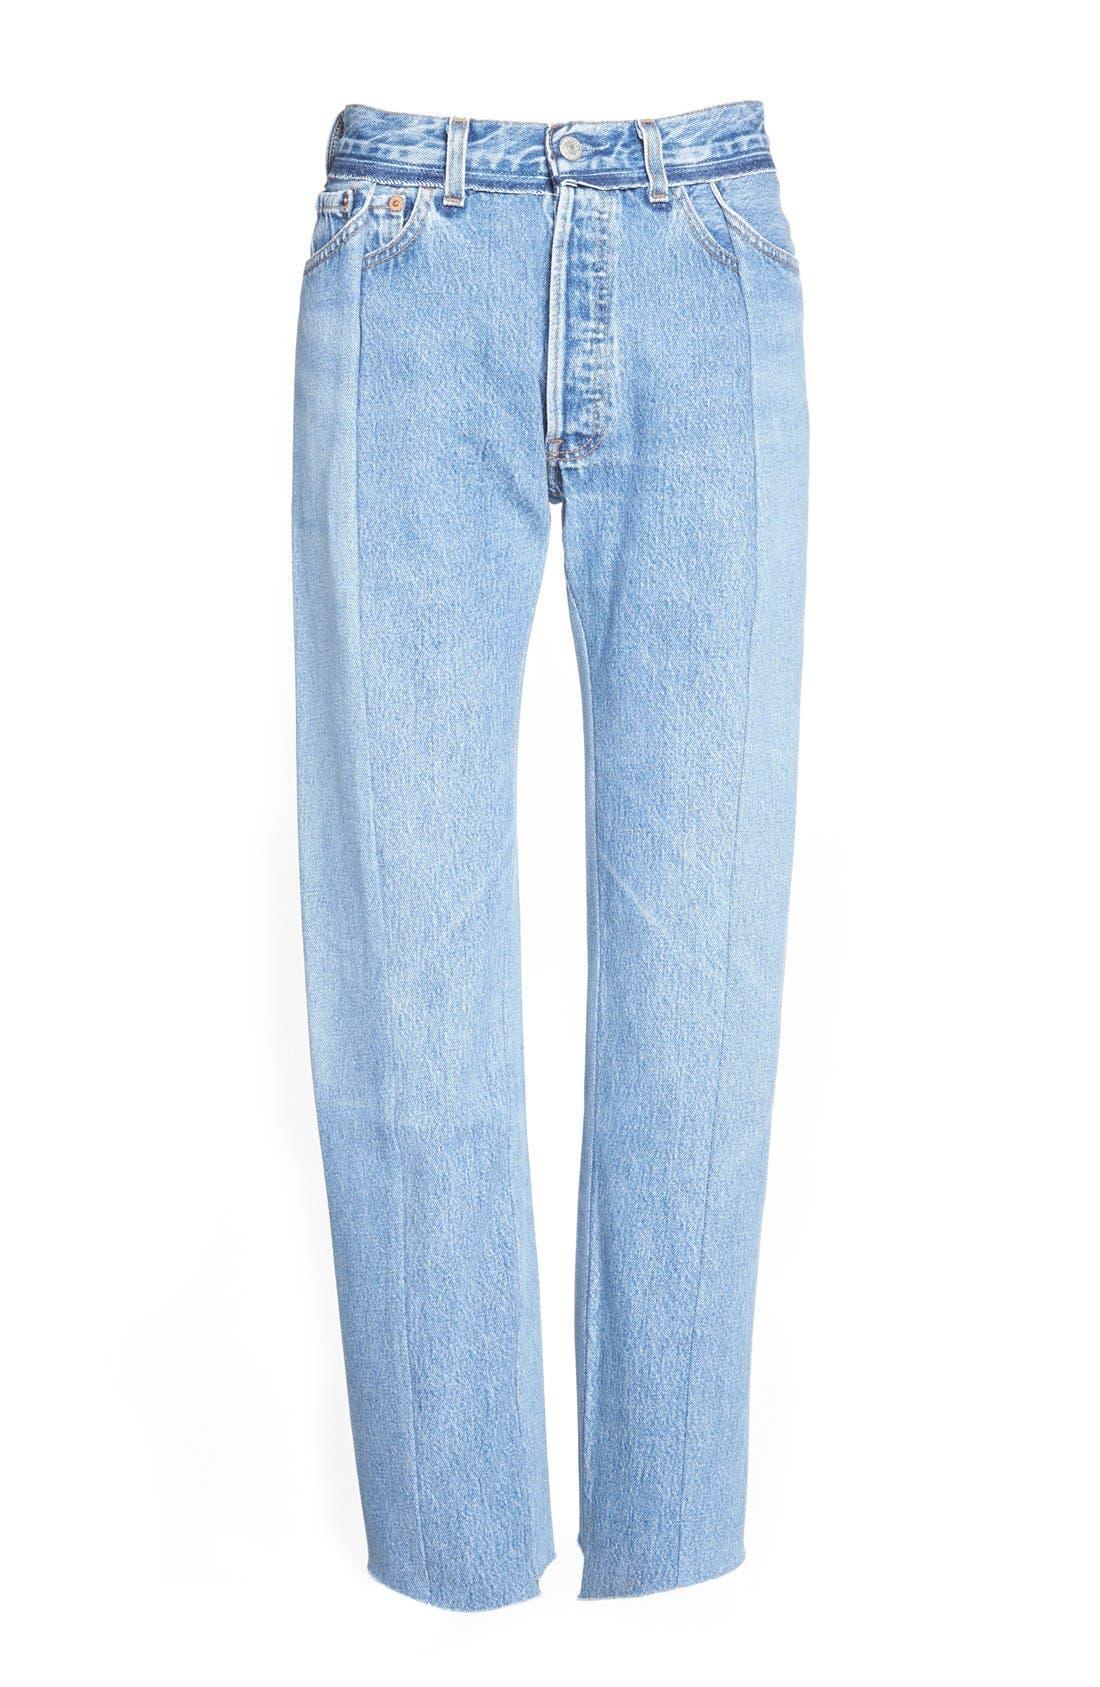 Deconstructed Crop Jeans,                         Main,                         color, 400